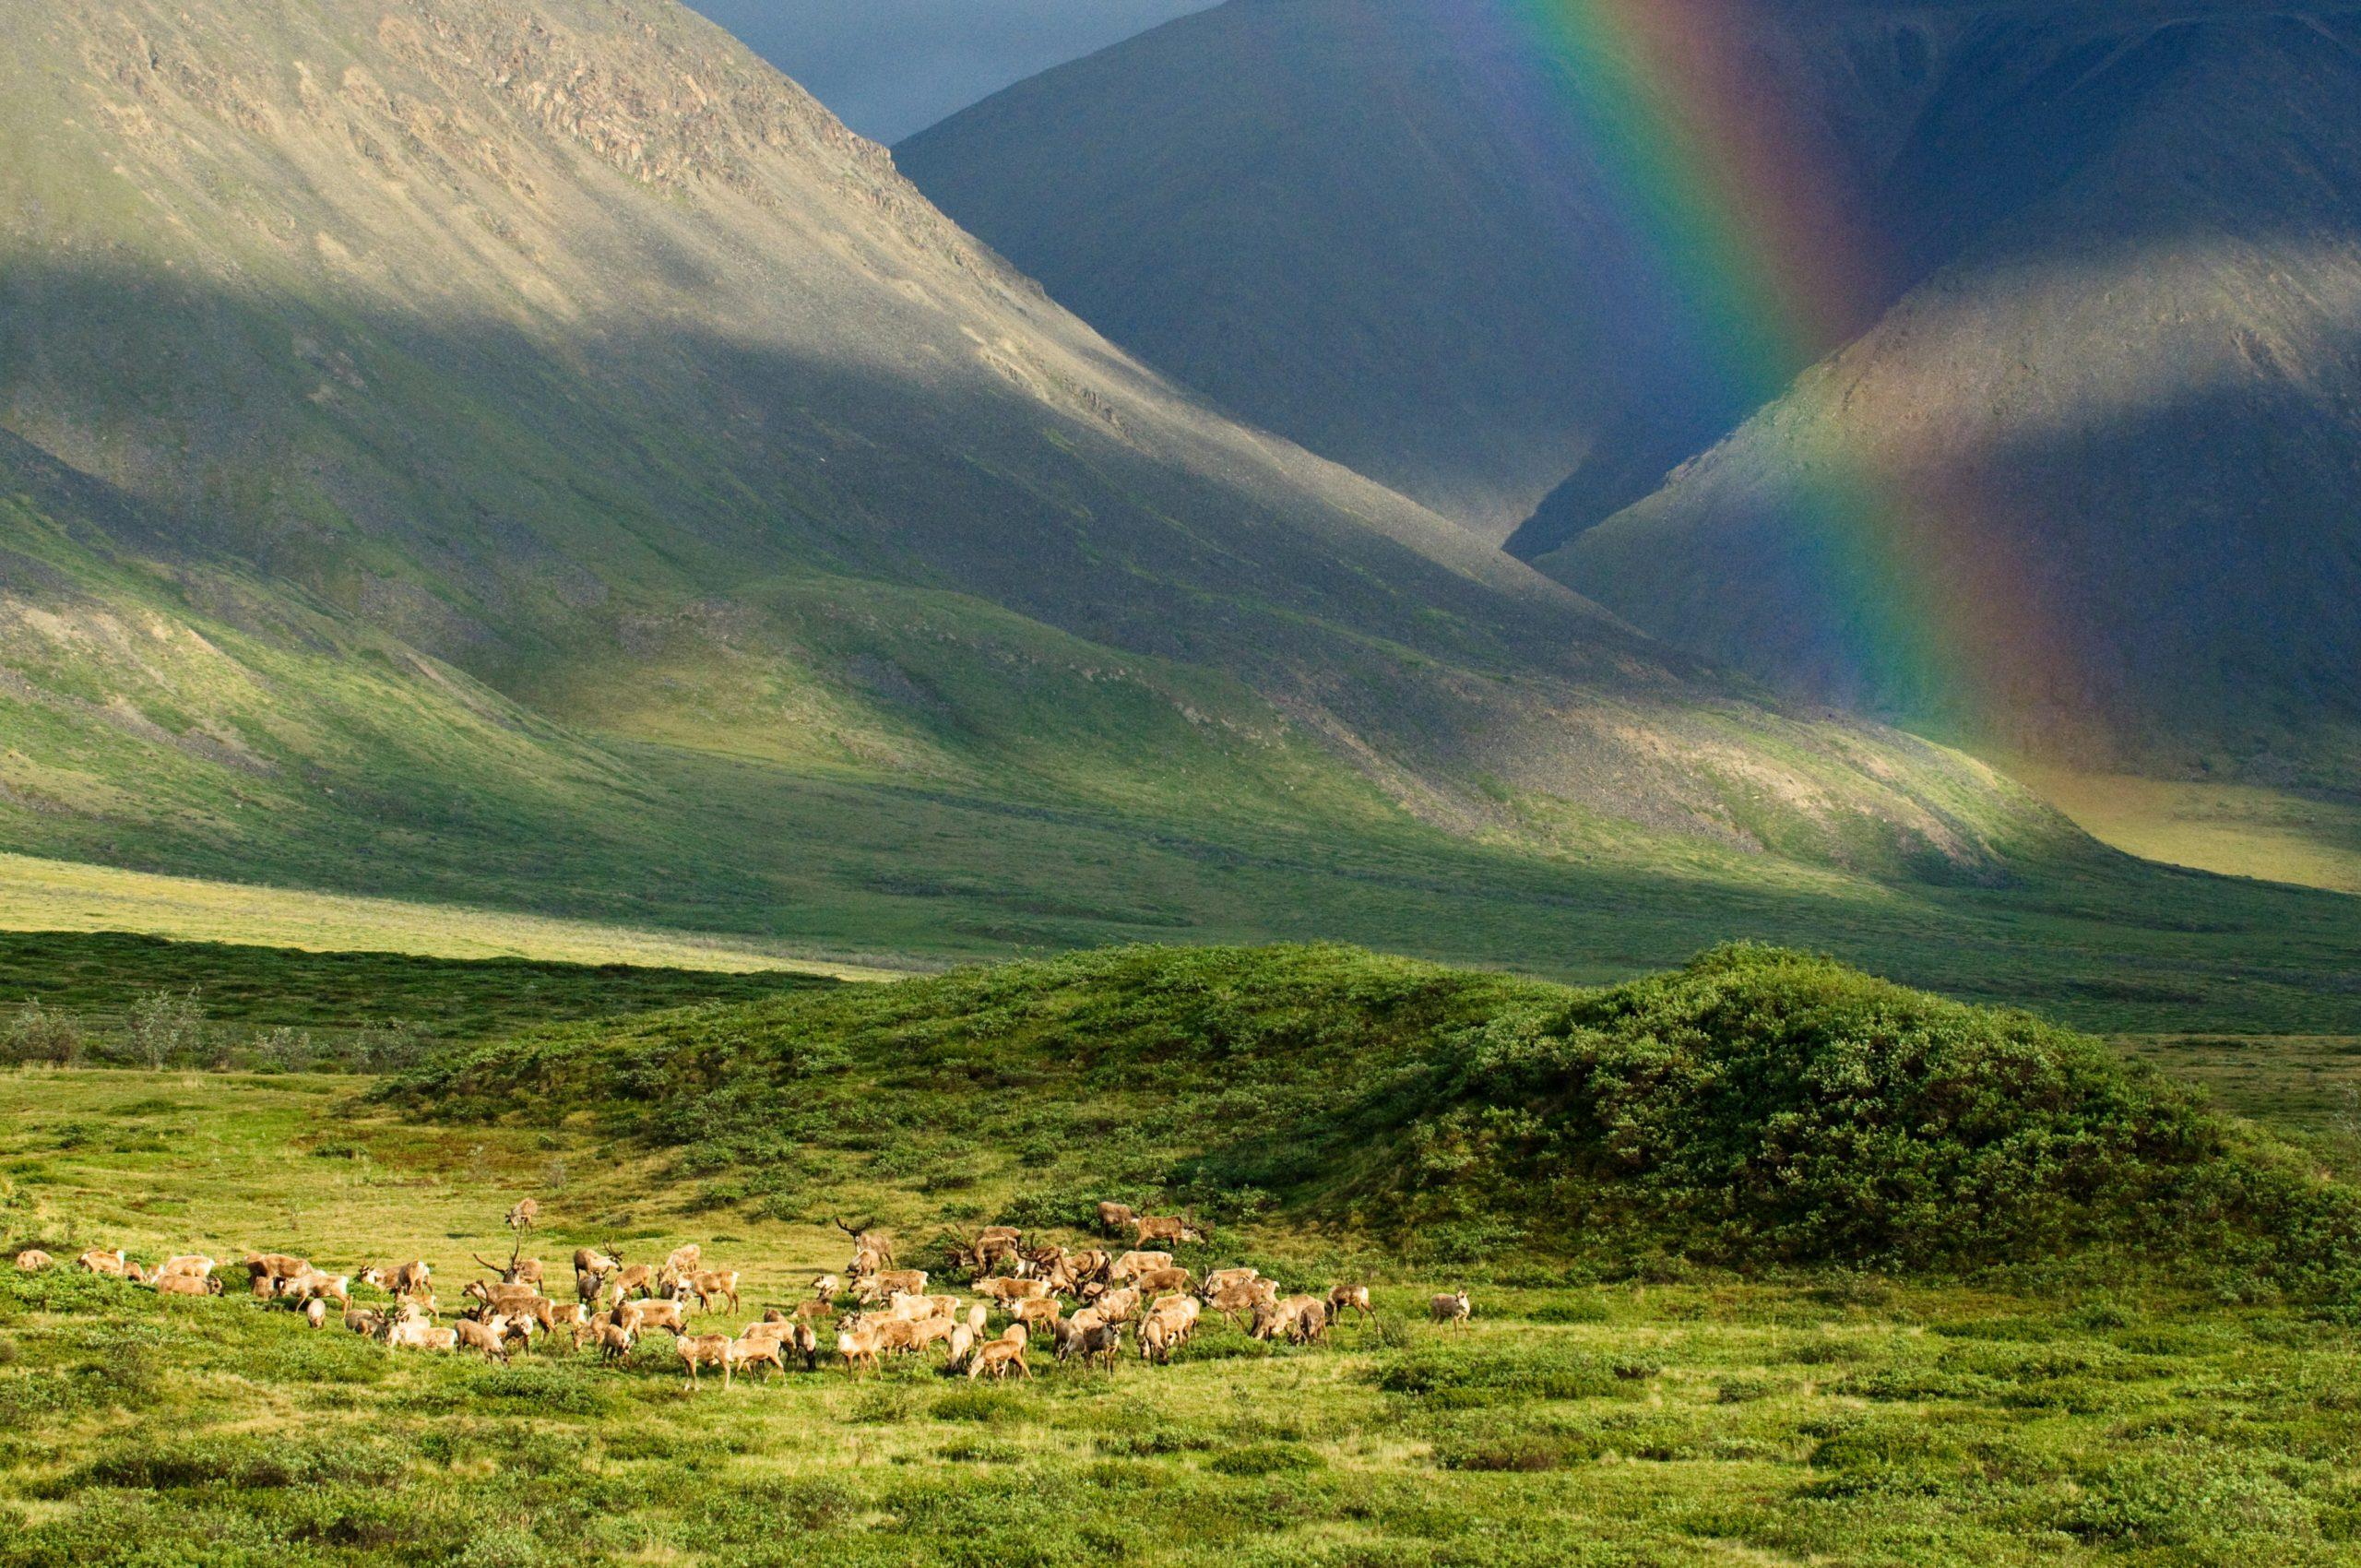 Alaska artic refuge